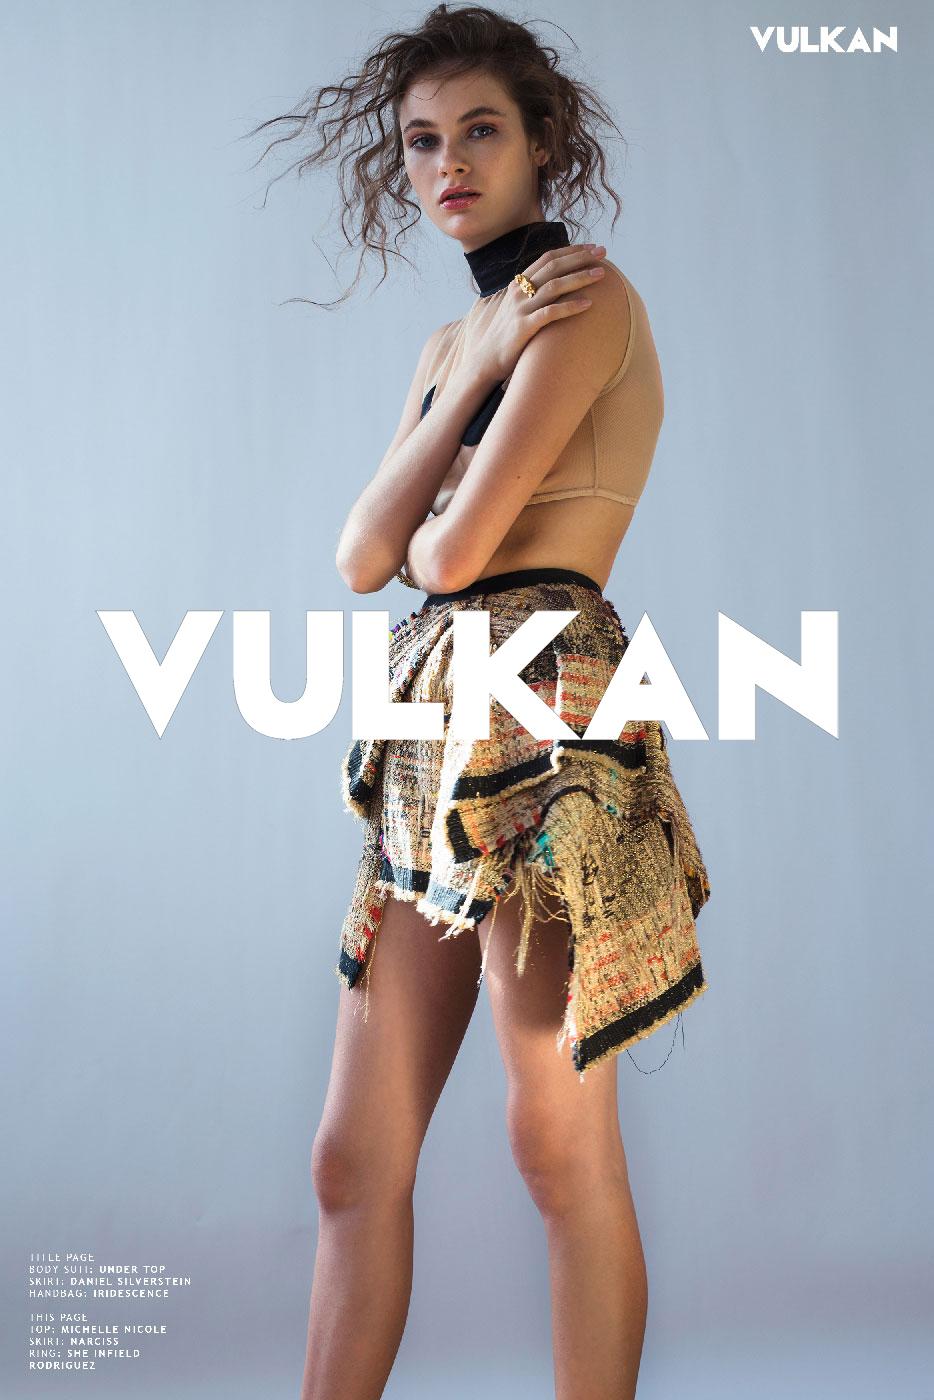 Vulkan Magazine 2017 .jpg